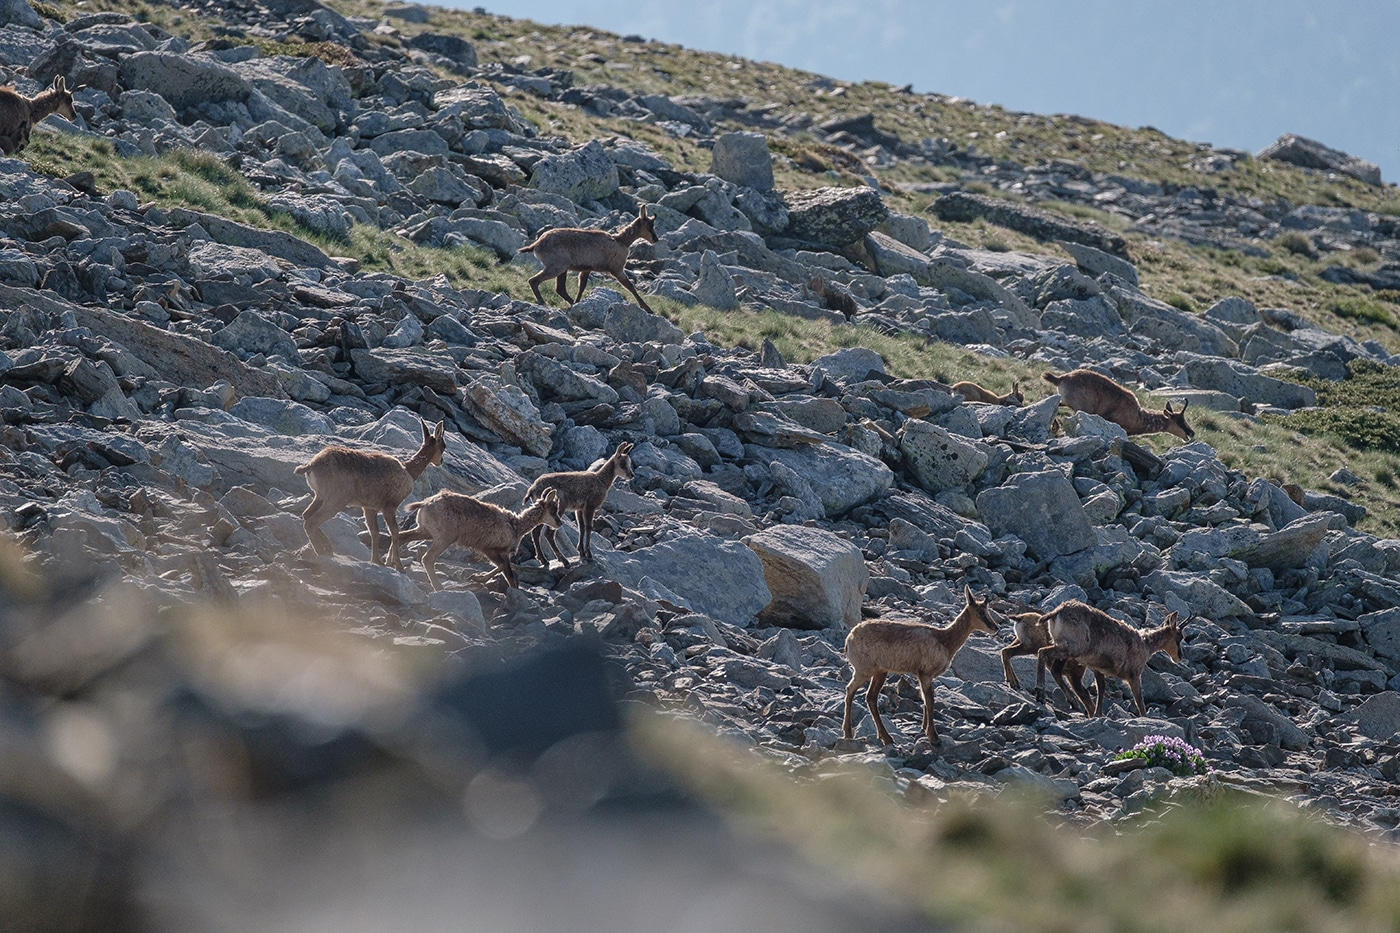 harde d'isards sauvages dans le massif du canigou